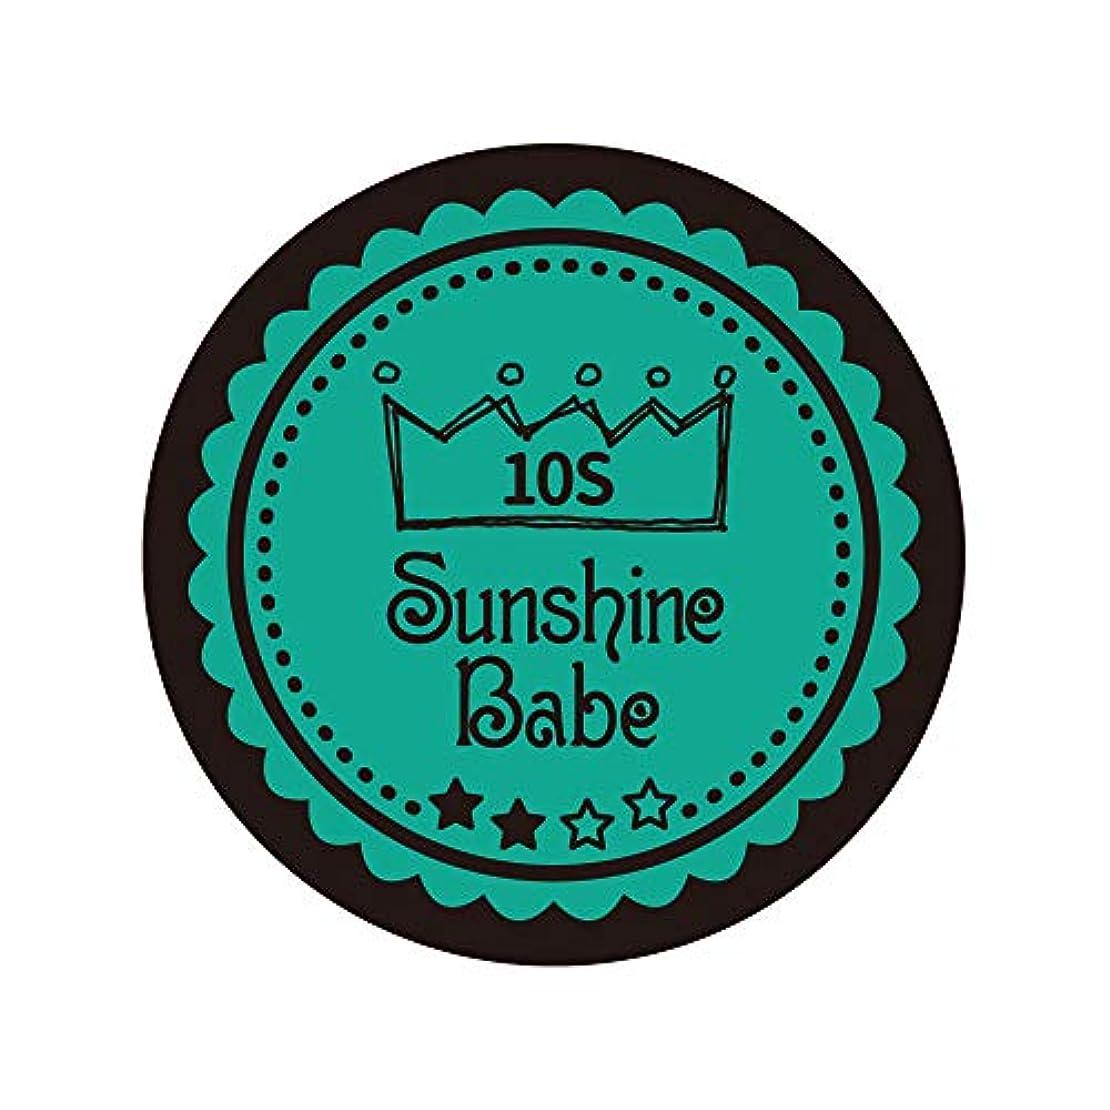 Sunshine Babe カラージェル 10S アルカディア 2.7g UV/LED対応